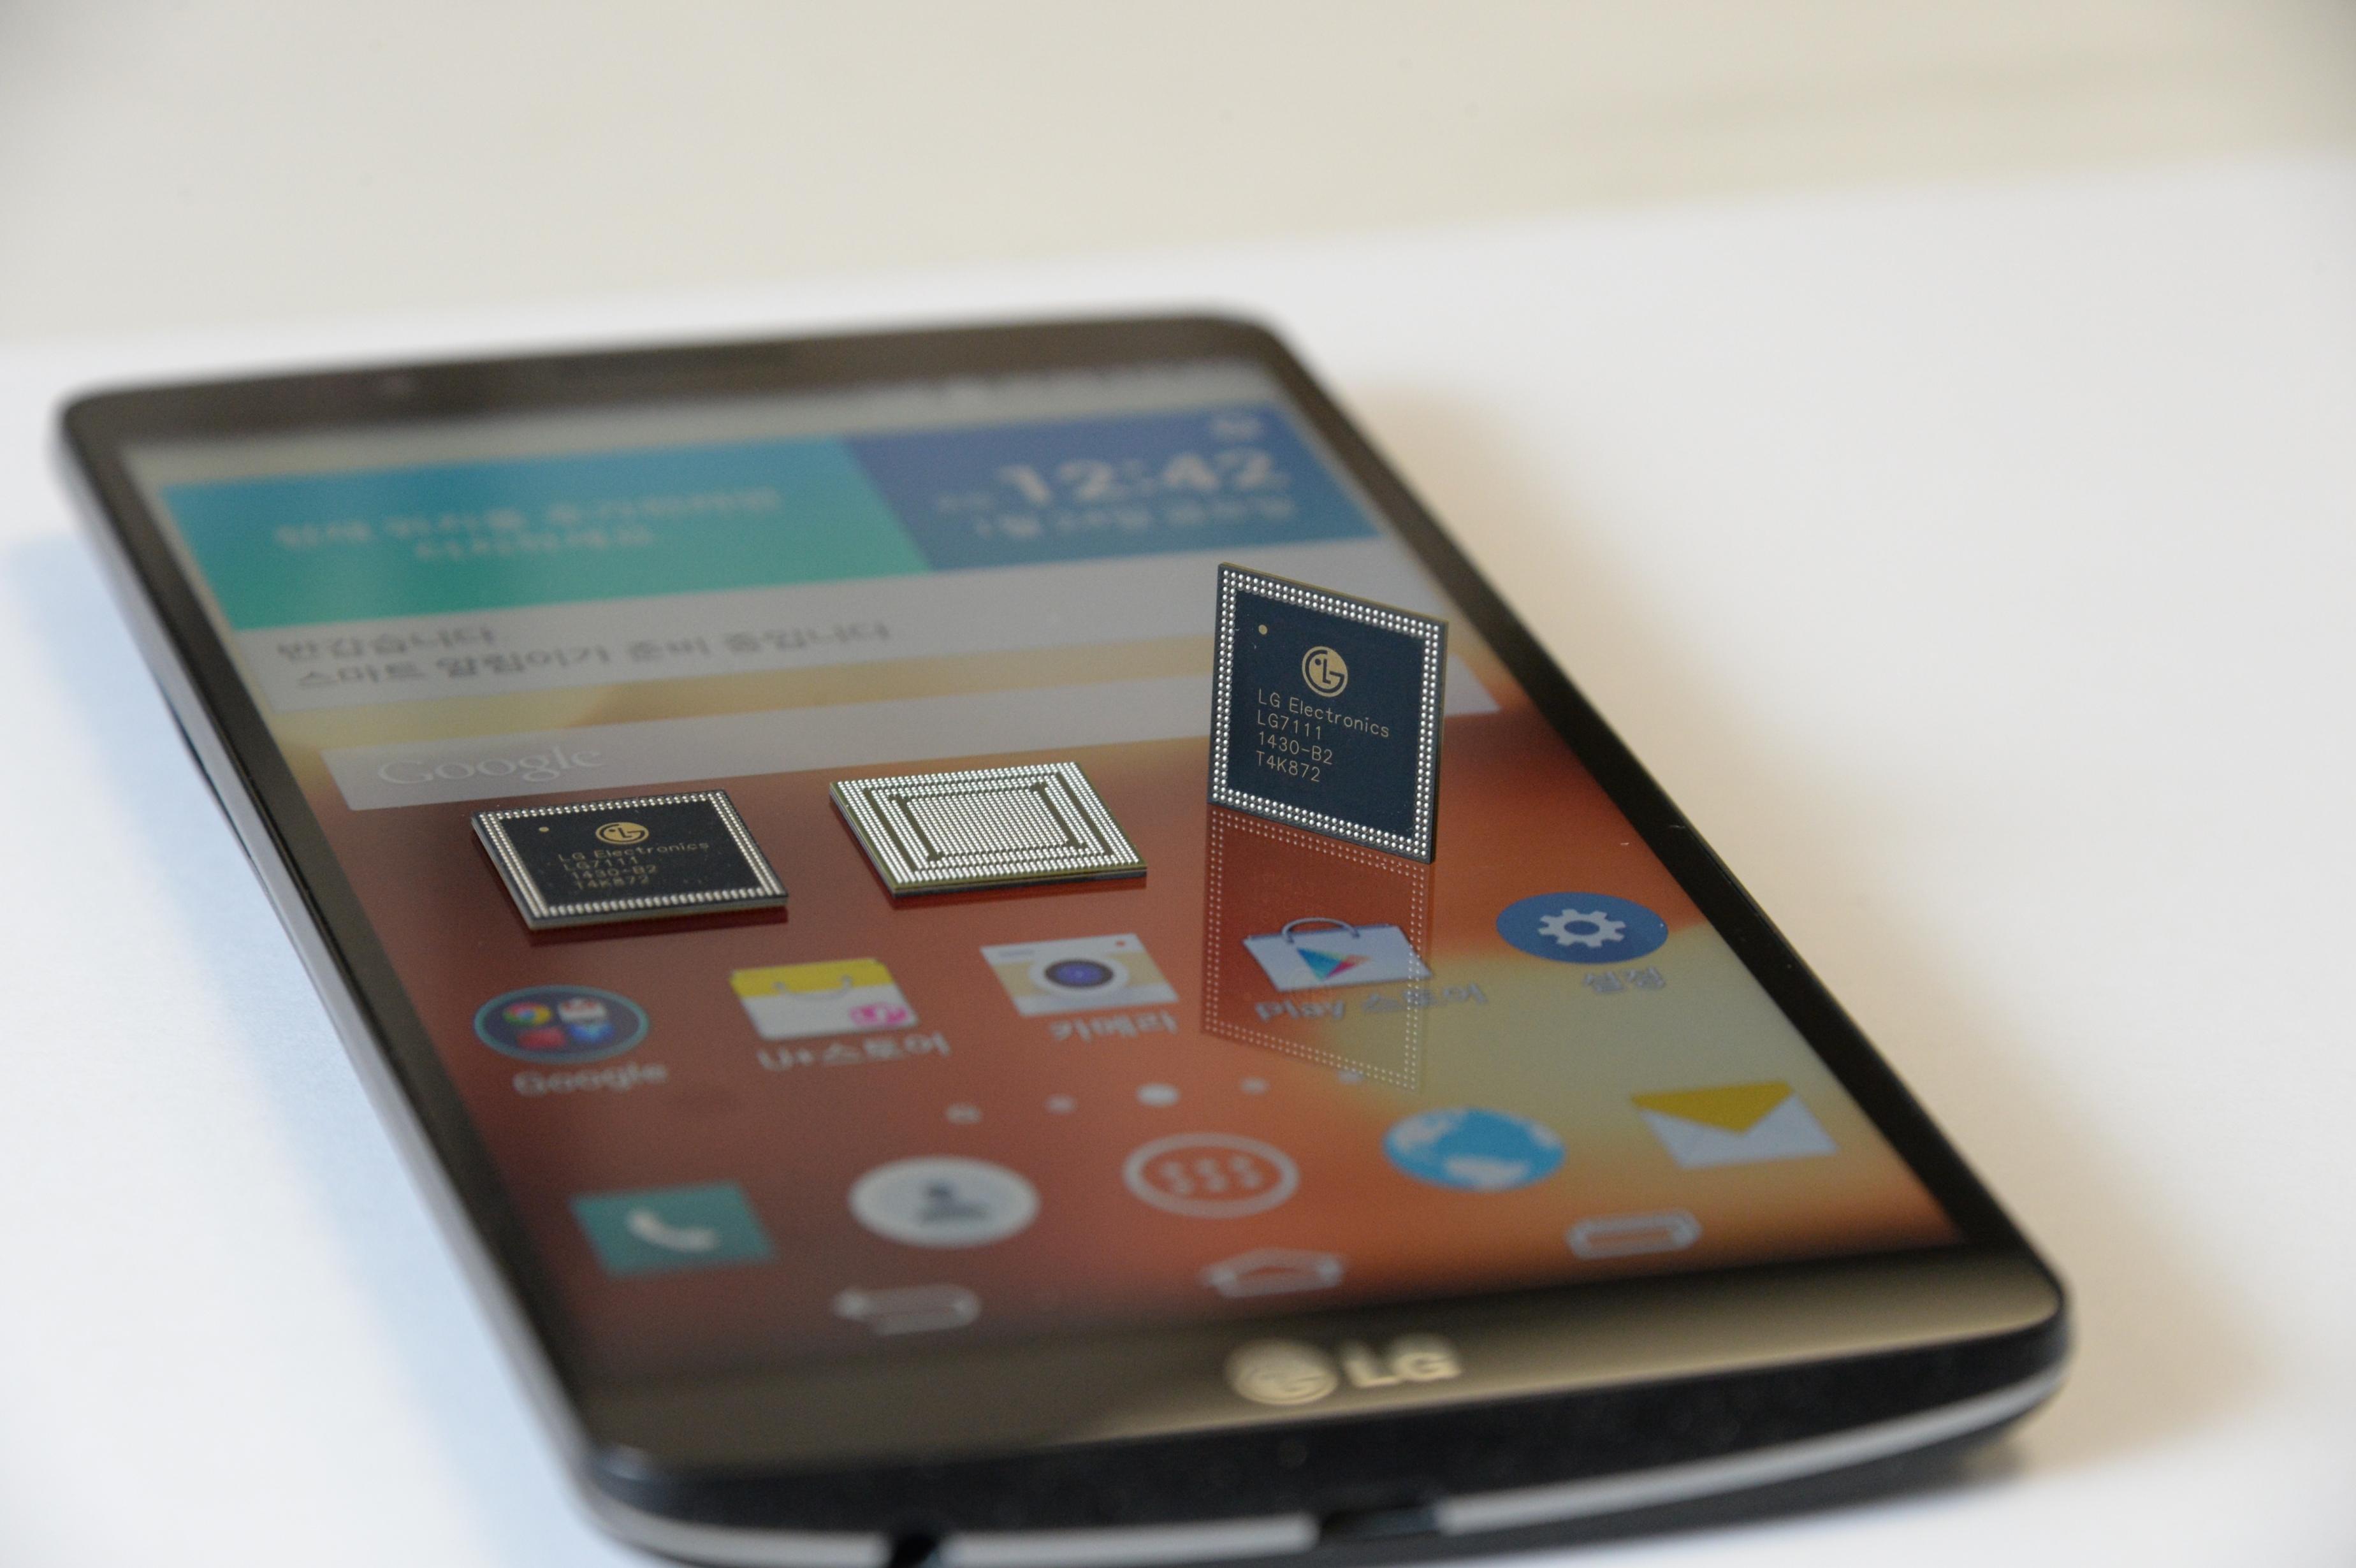 LG G3 Screen (1)